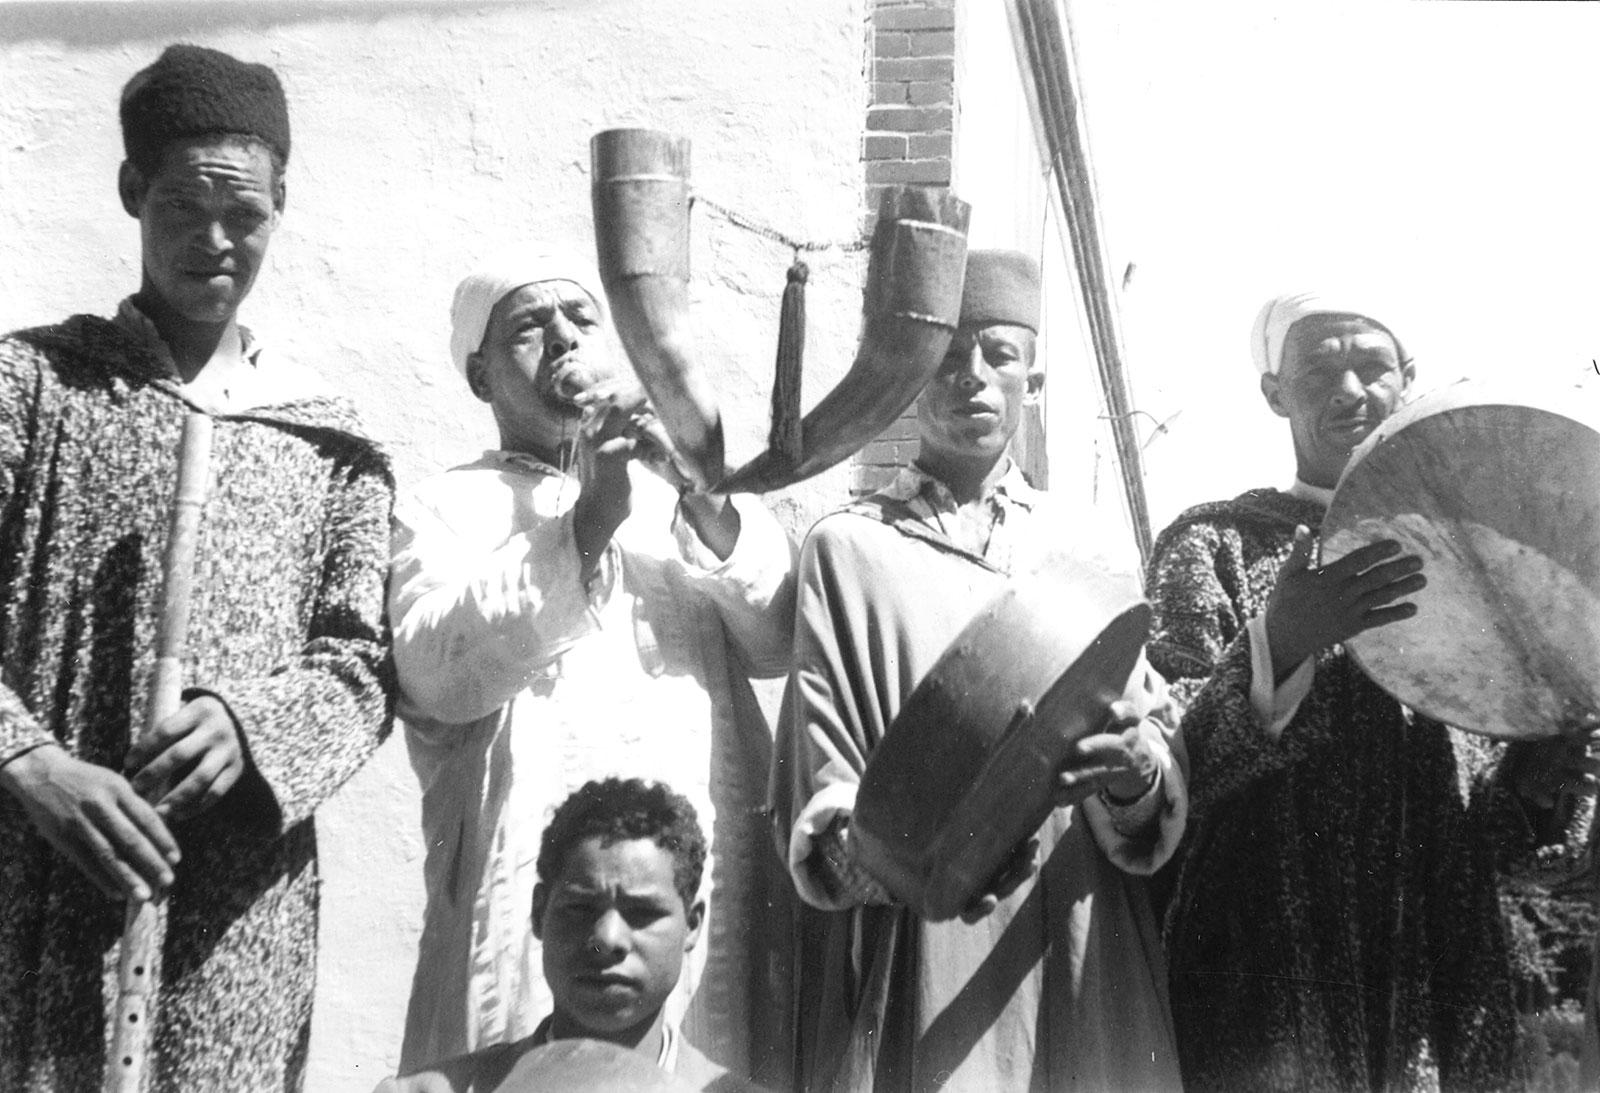 Moroccan musicians, 1959